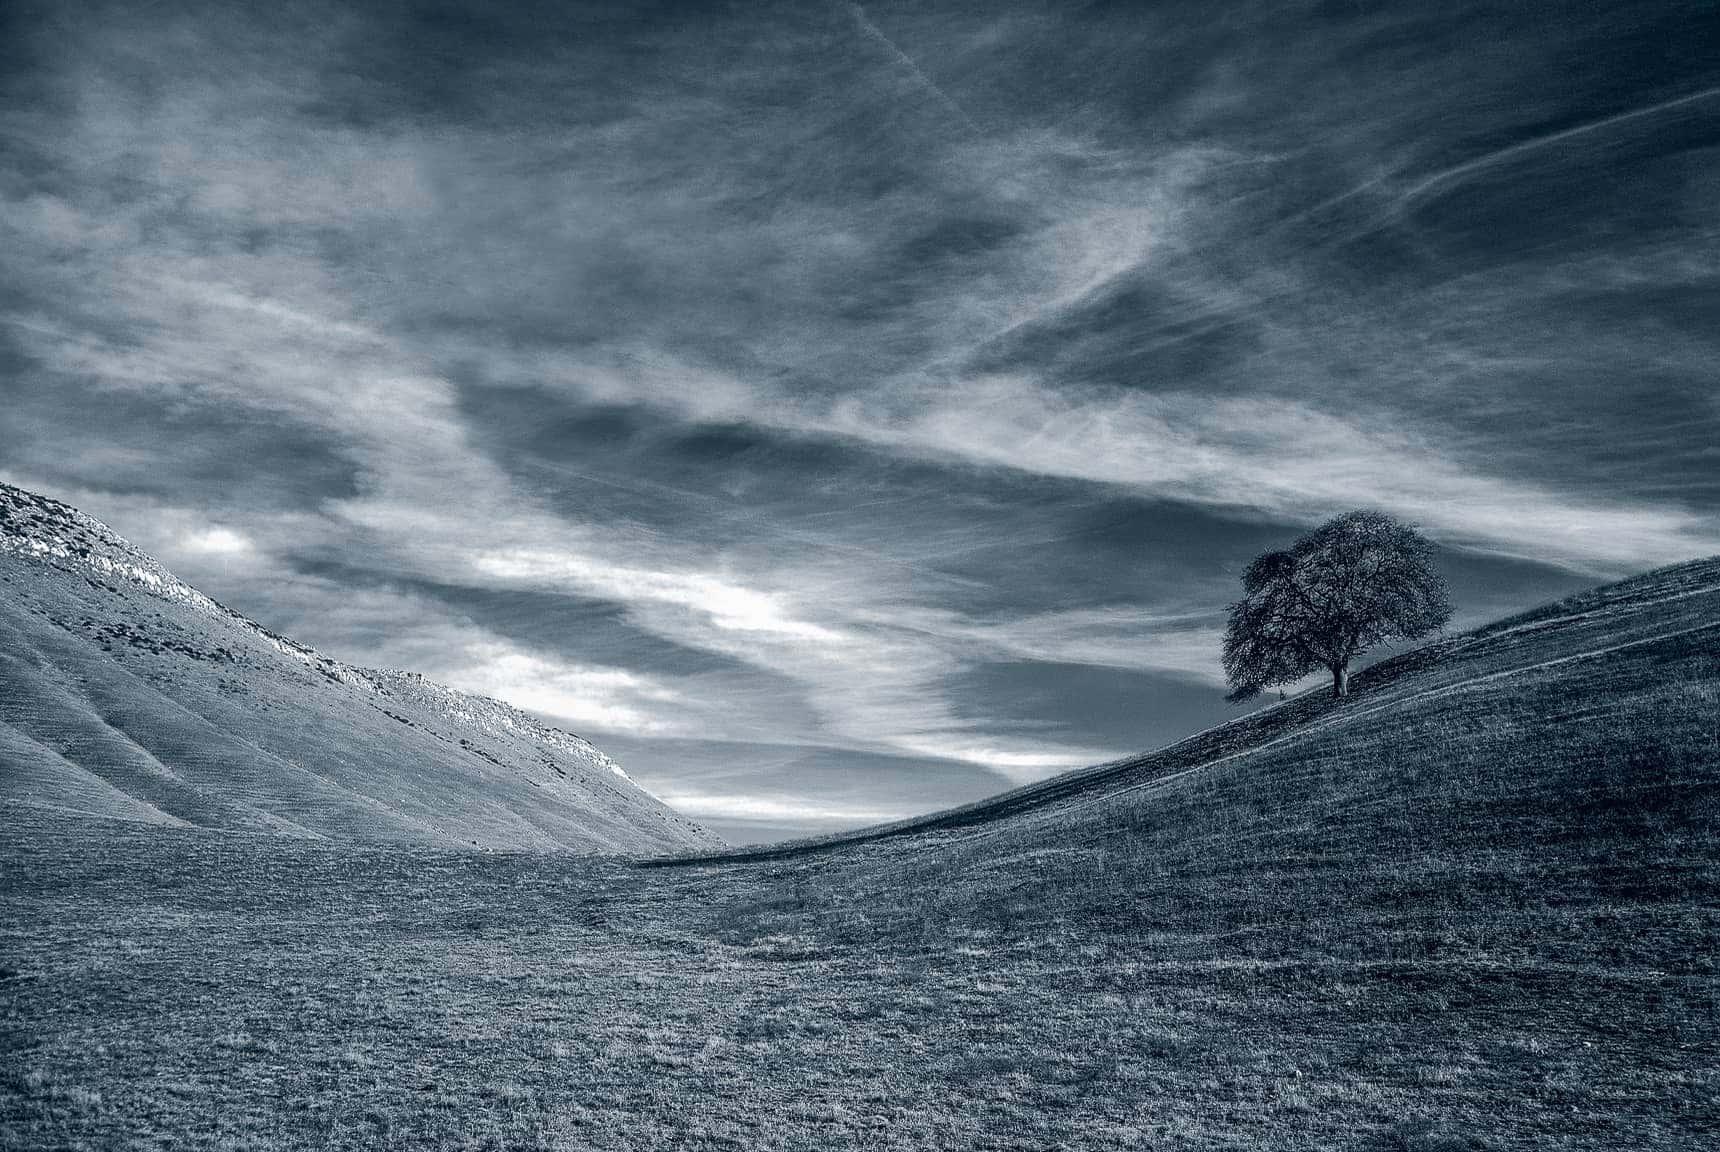 Professional Landscape Photography Large Format BW Images